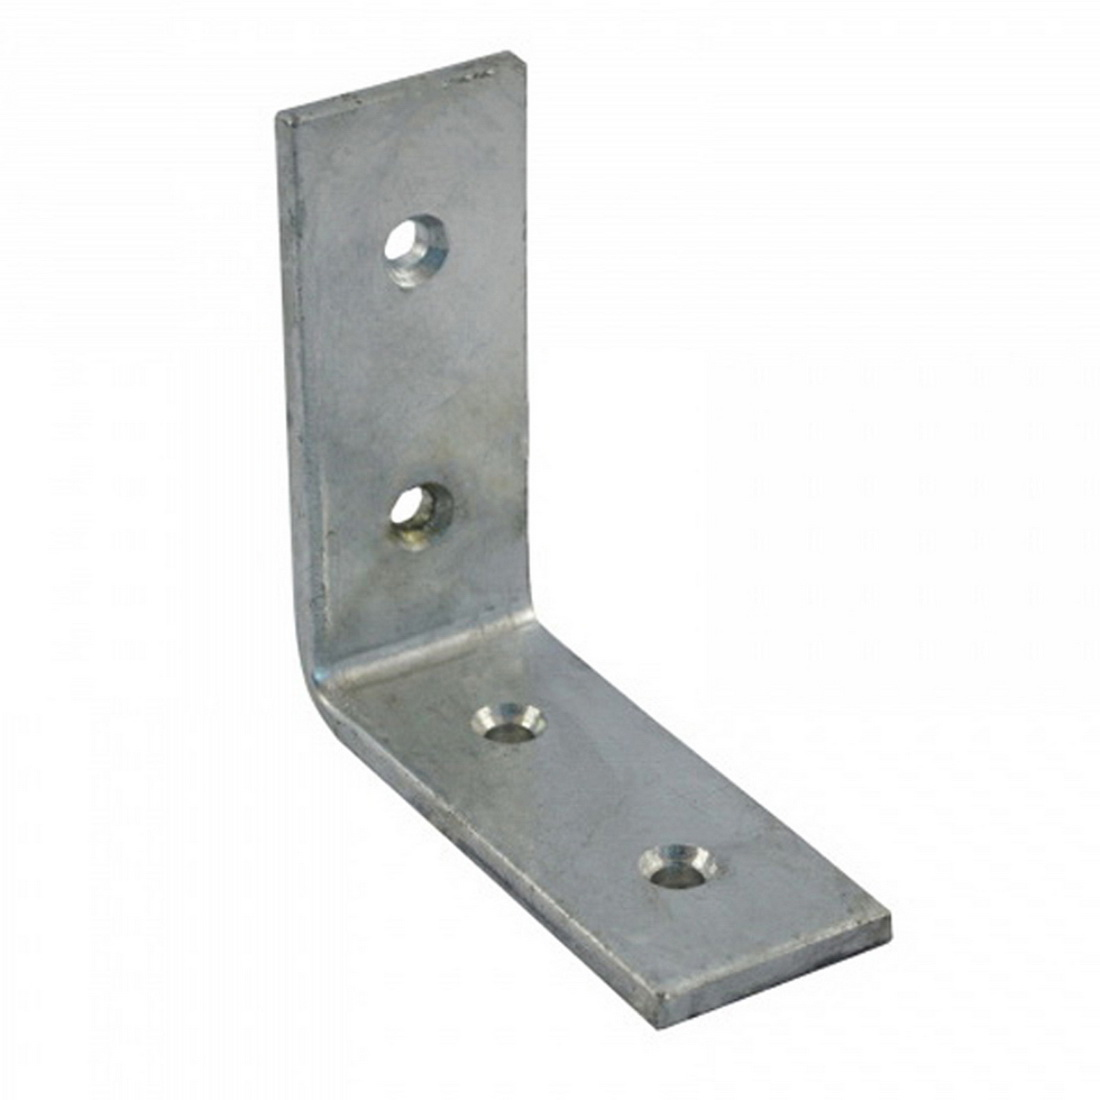 Heavy Duty Angle Bracket 150 x 150 x 40mm Zinc Plated BANHZ150E040R